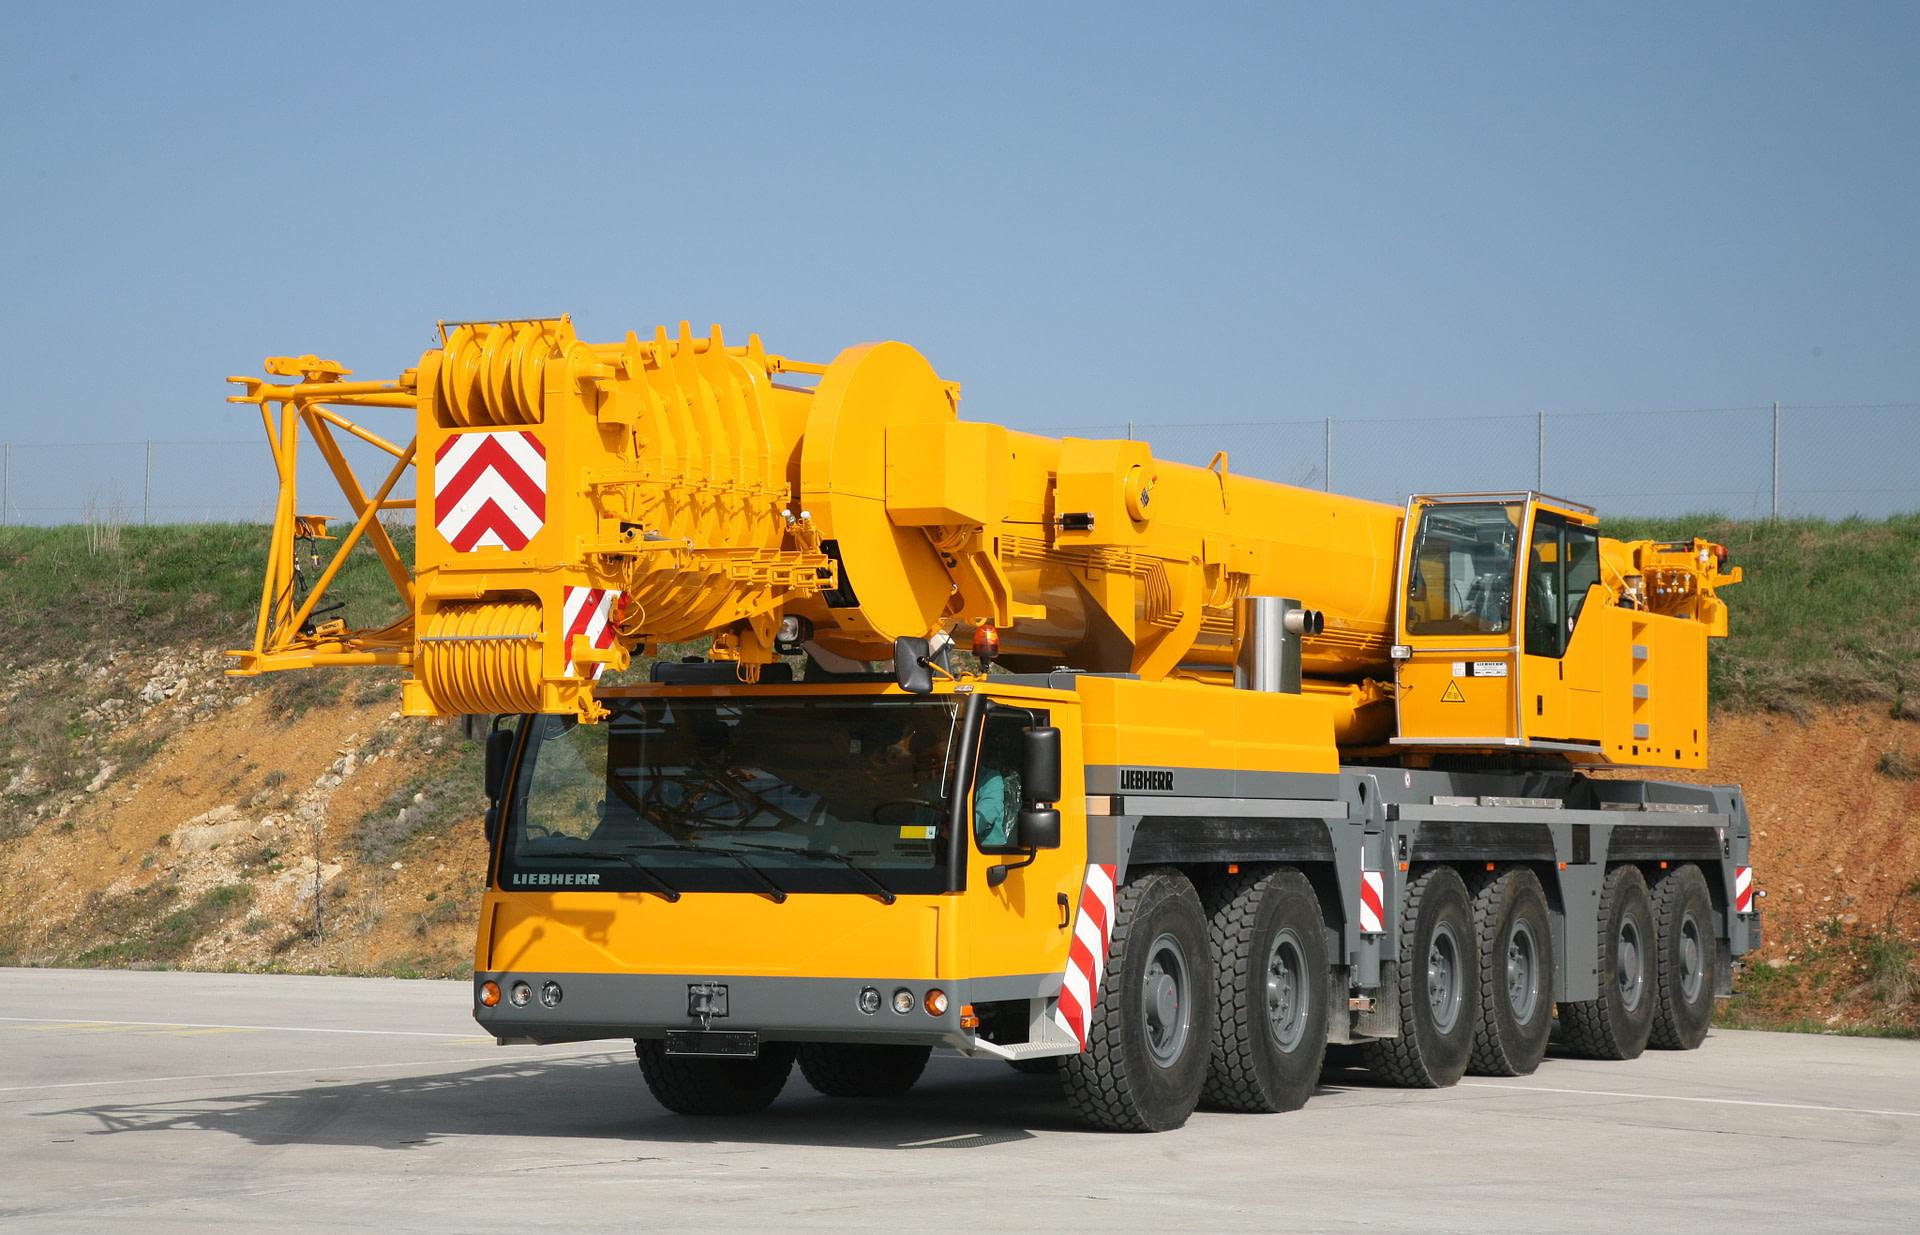 Автокран LIEBHERR LTM 1220 (220 тон, стріла 96м)